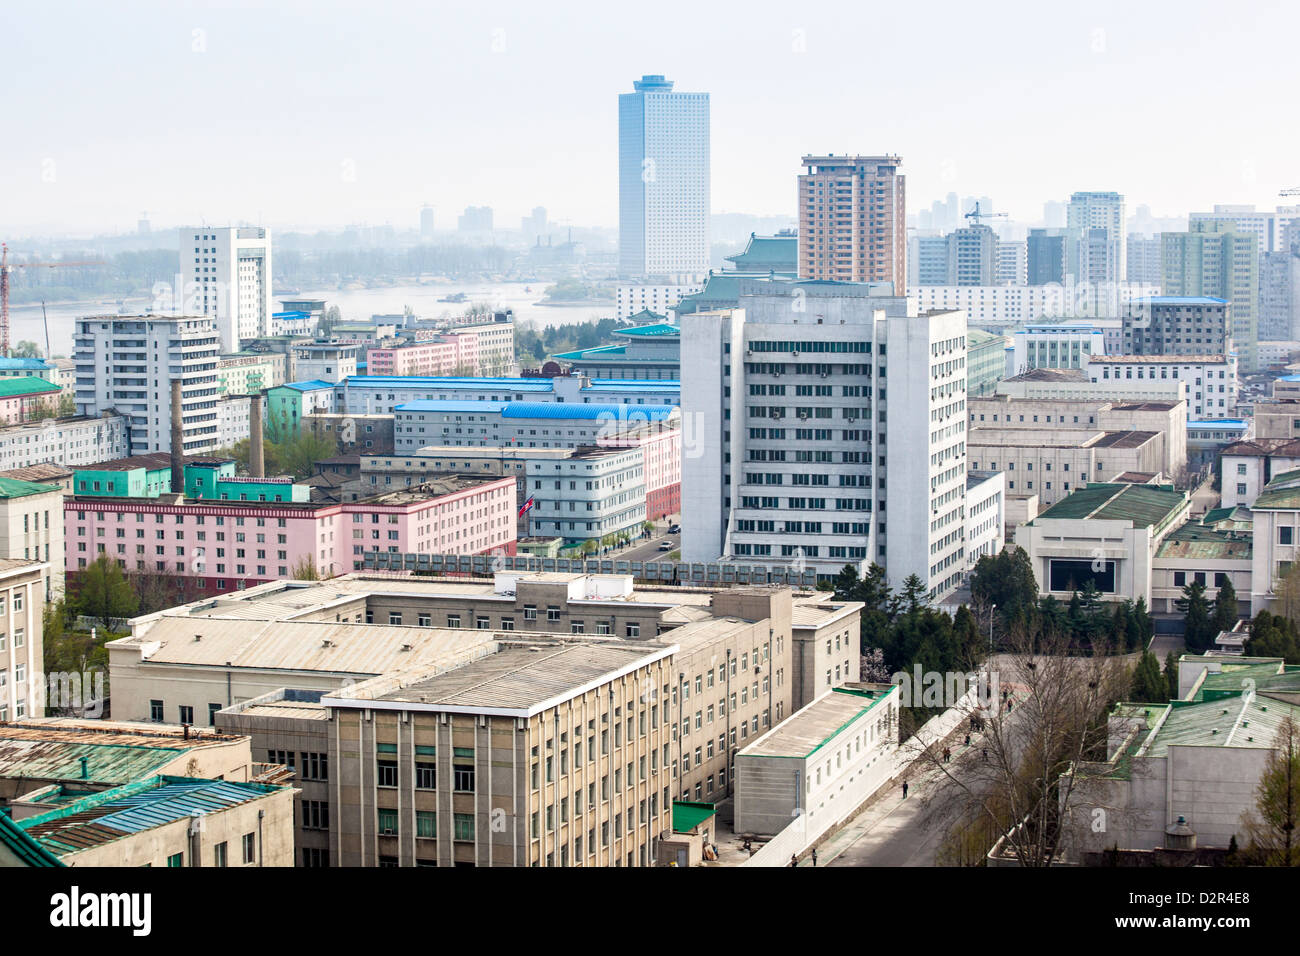 City skyline, Pyongyang, Democratic People's Republic of Korea (DPRK), North Korea, Asia - Stock Image